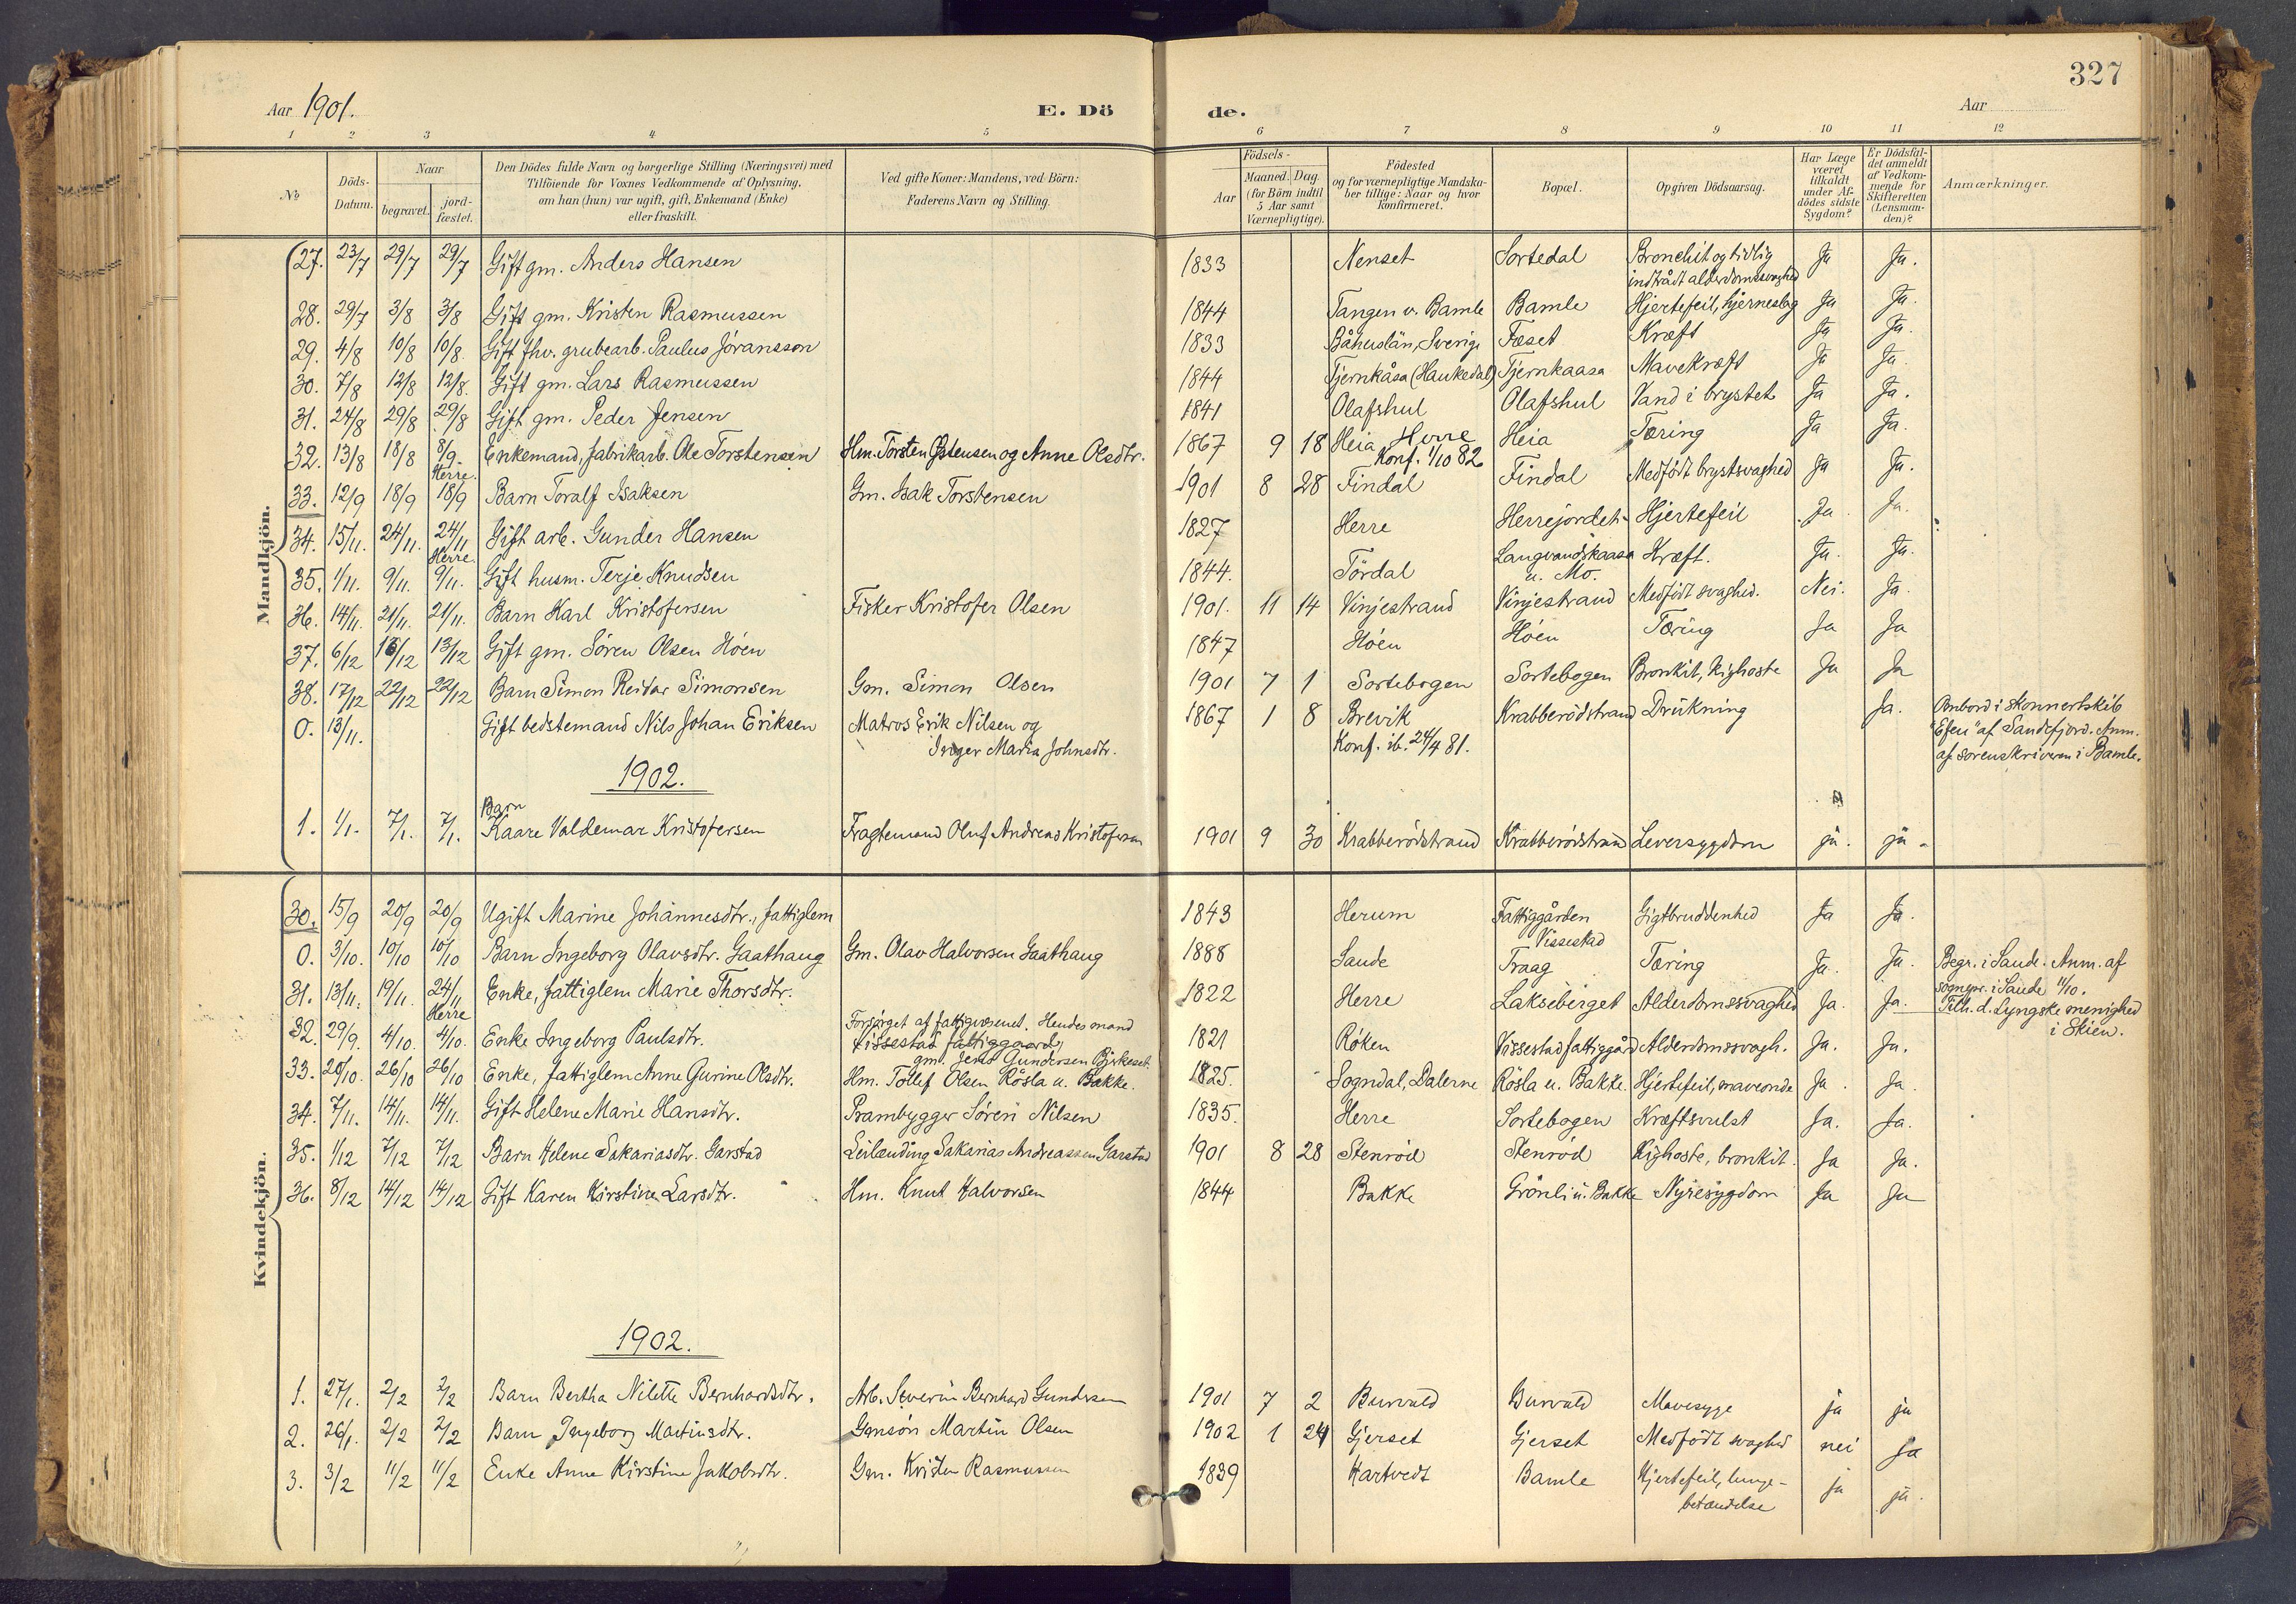 SAKO, Bamble kirkebøker, F/Fa/L0009: Ministerialbok nr. I 9, 1901-1917, s. 327